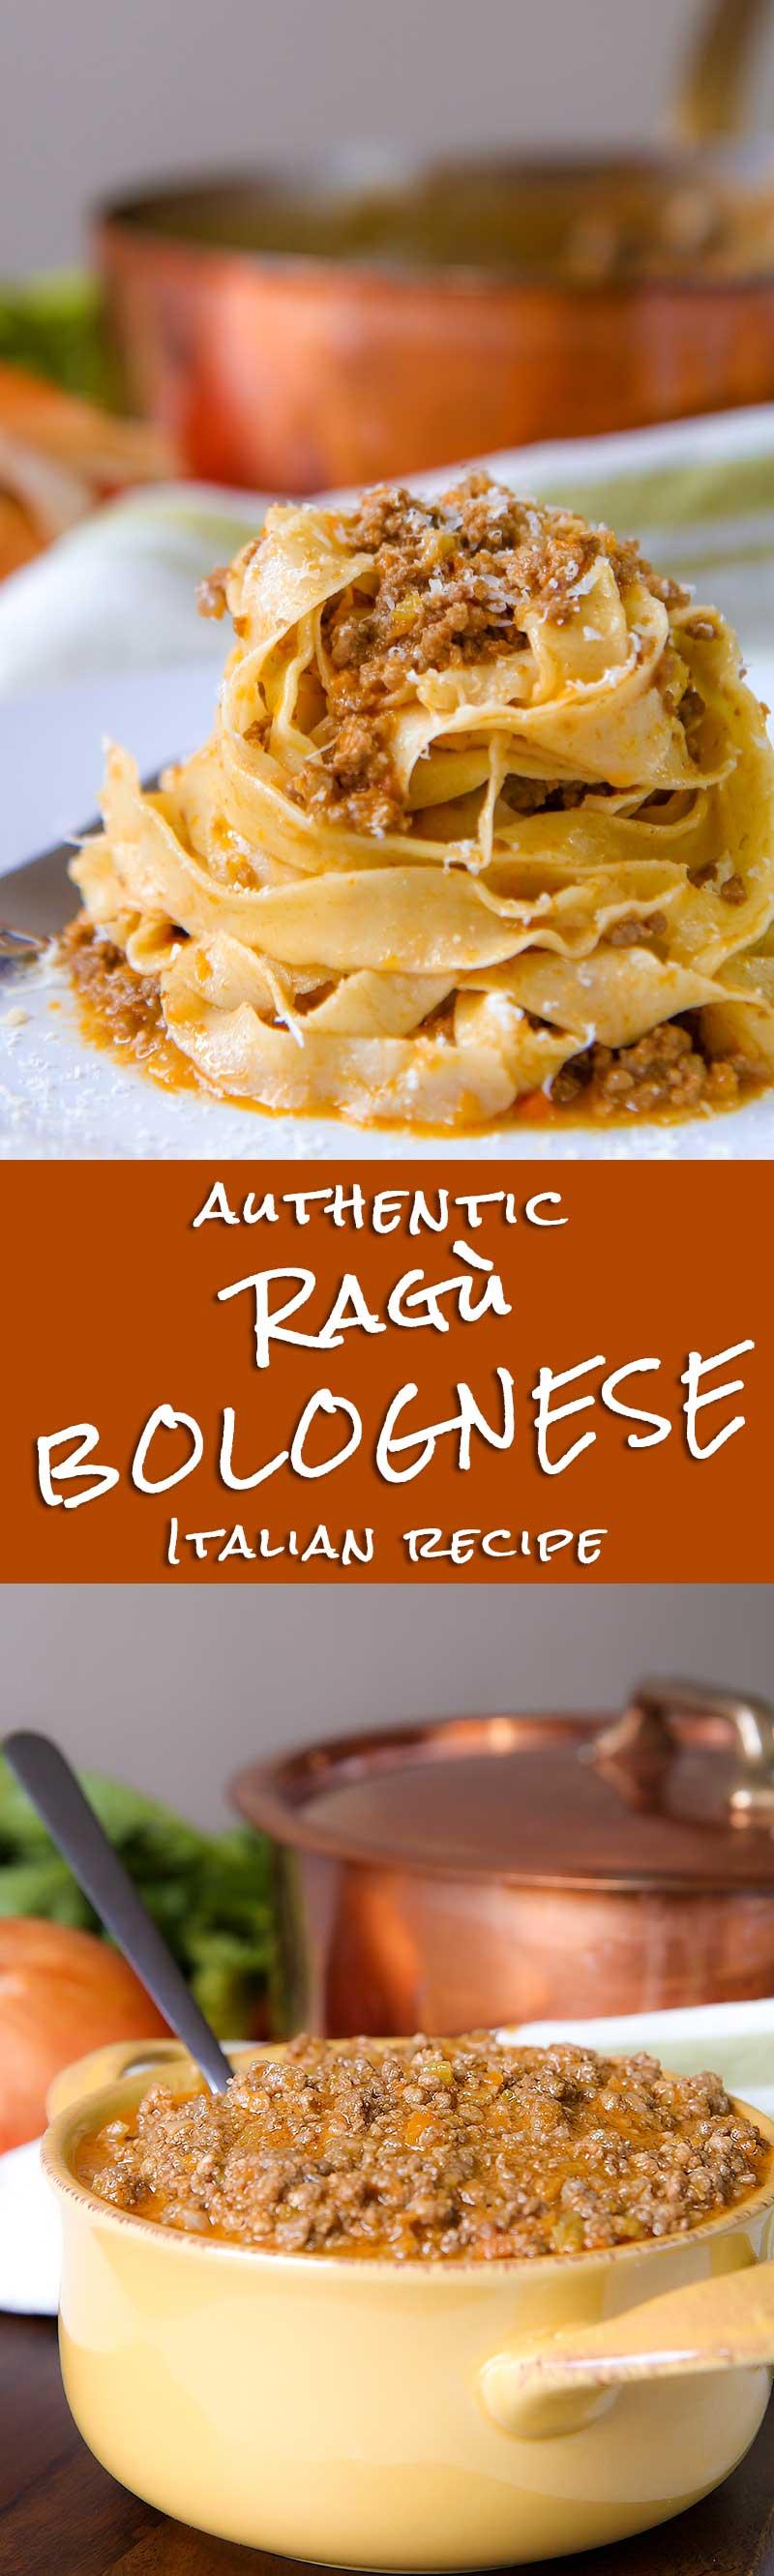 AUTHENTIC BOLOGNESE SAUCE (Ragù alla Bolognese)